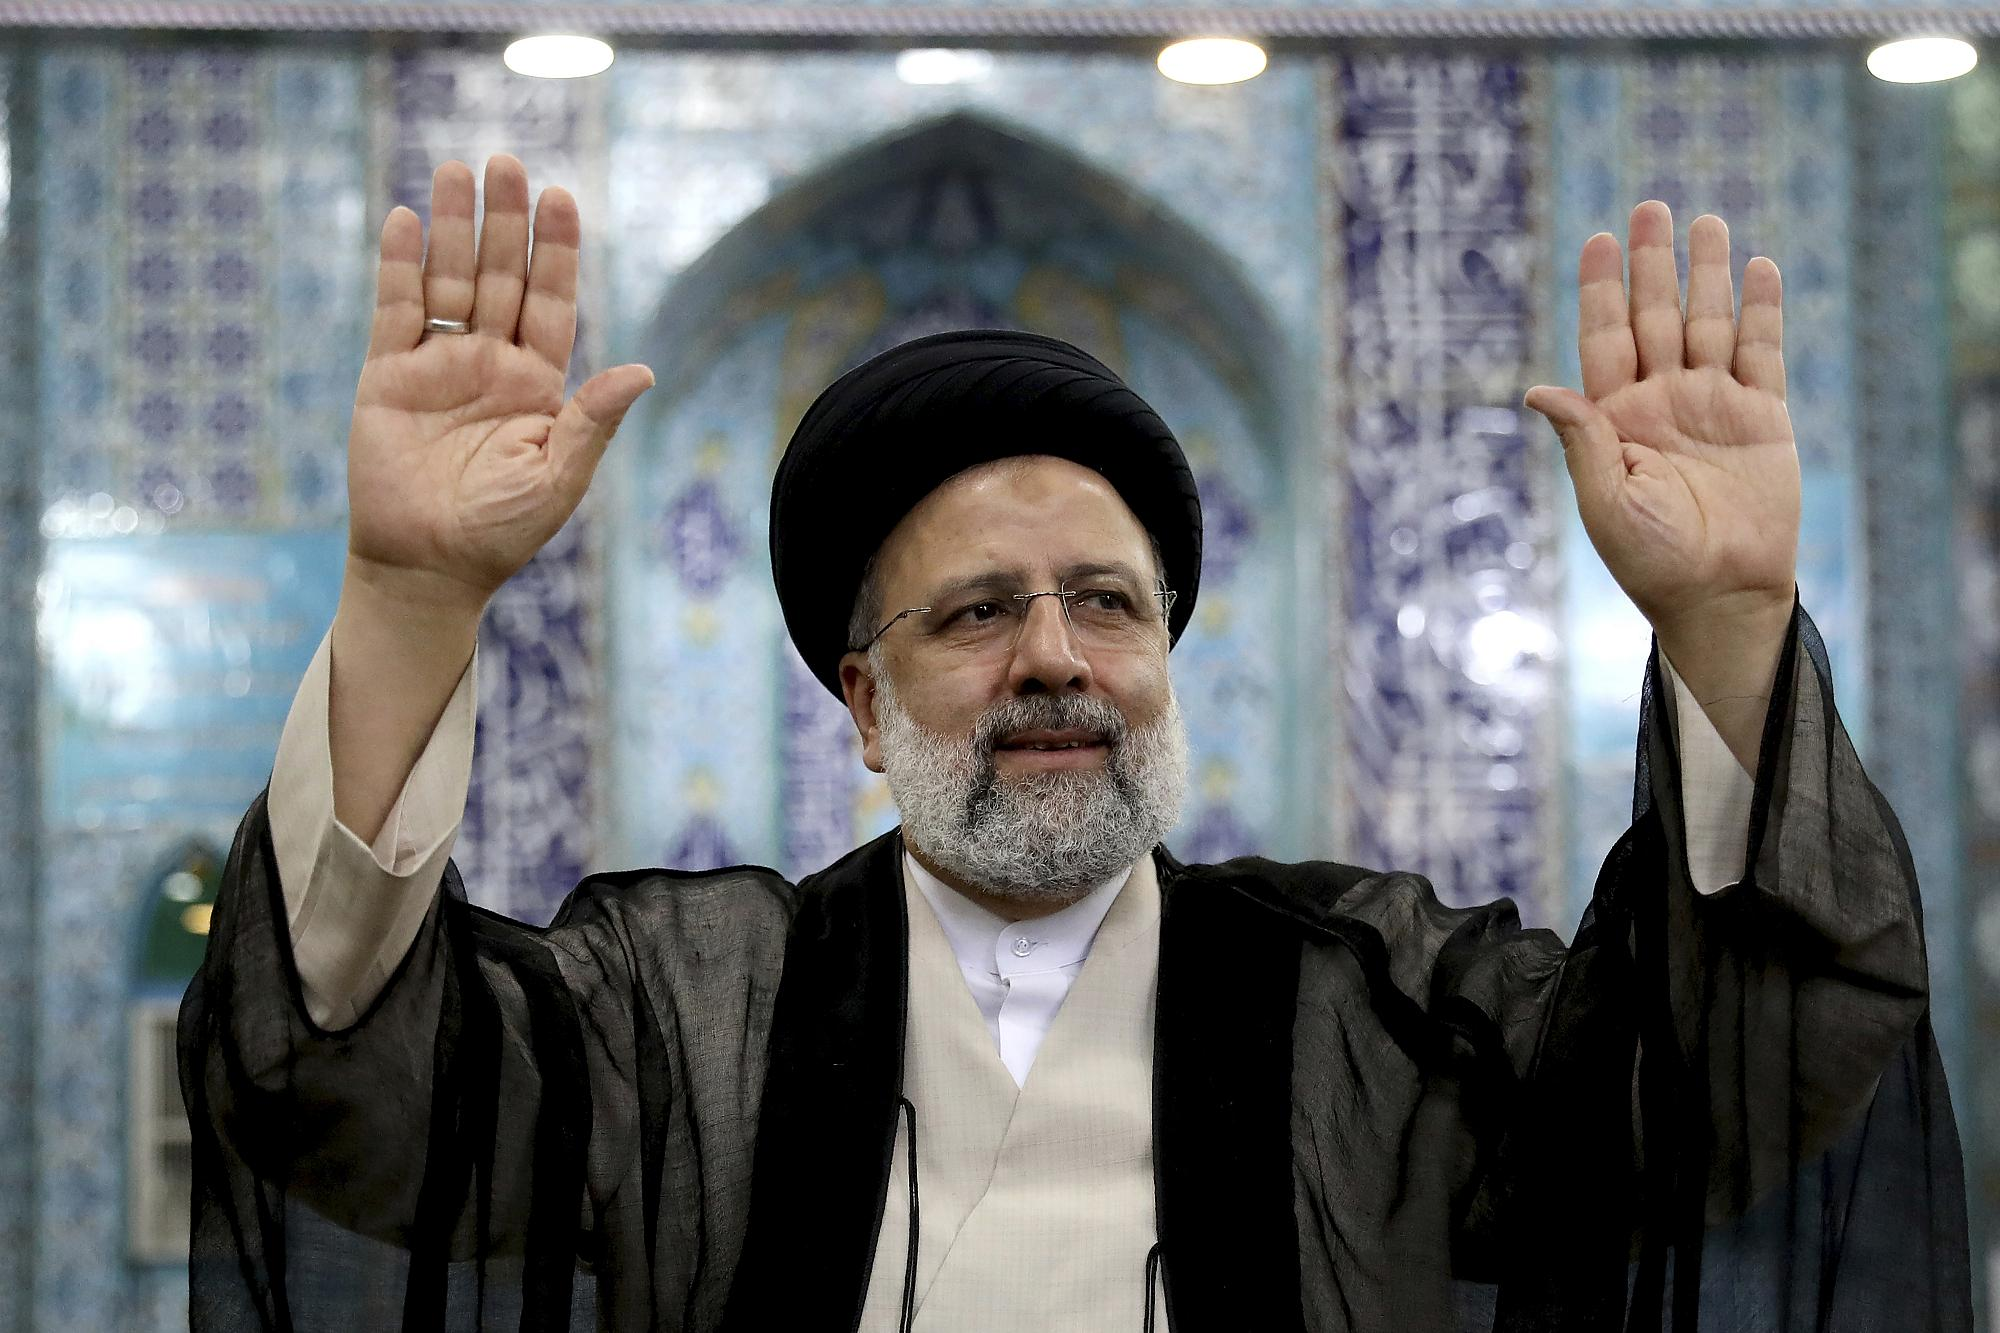 Ebrahim Raisi wins Iran's 2021 Presidential Election | ஈரானின் 2021 ஜனாதிபதித் தேர்தலில் இப்ராஹிம் ரைசி வெற்றி பெற்றார் |_40.1